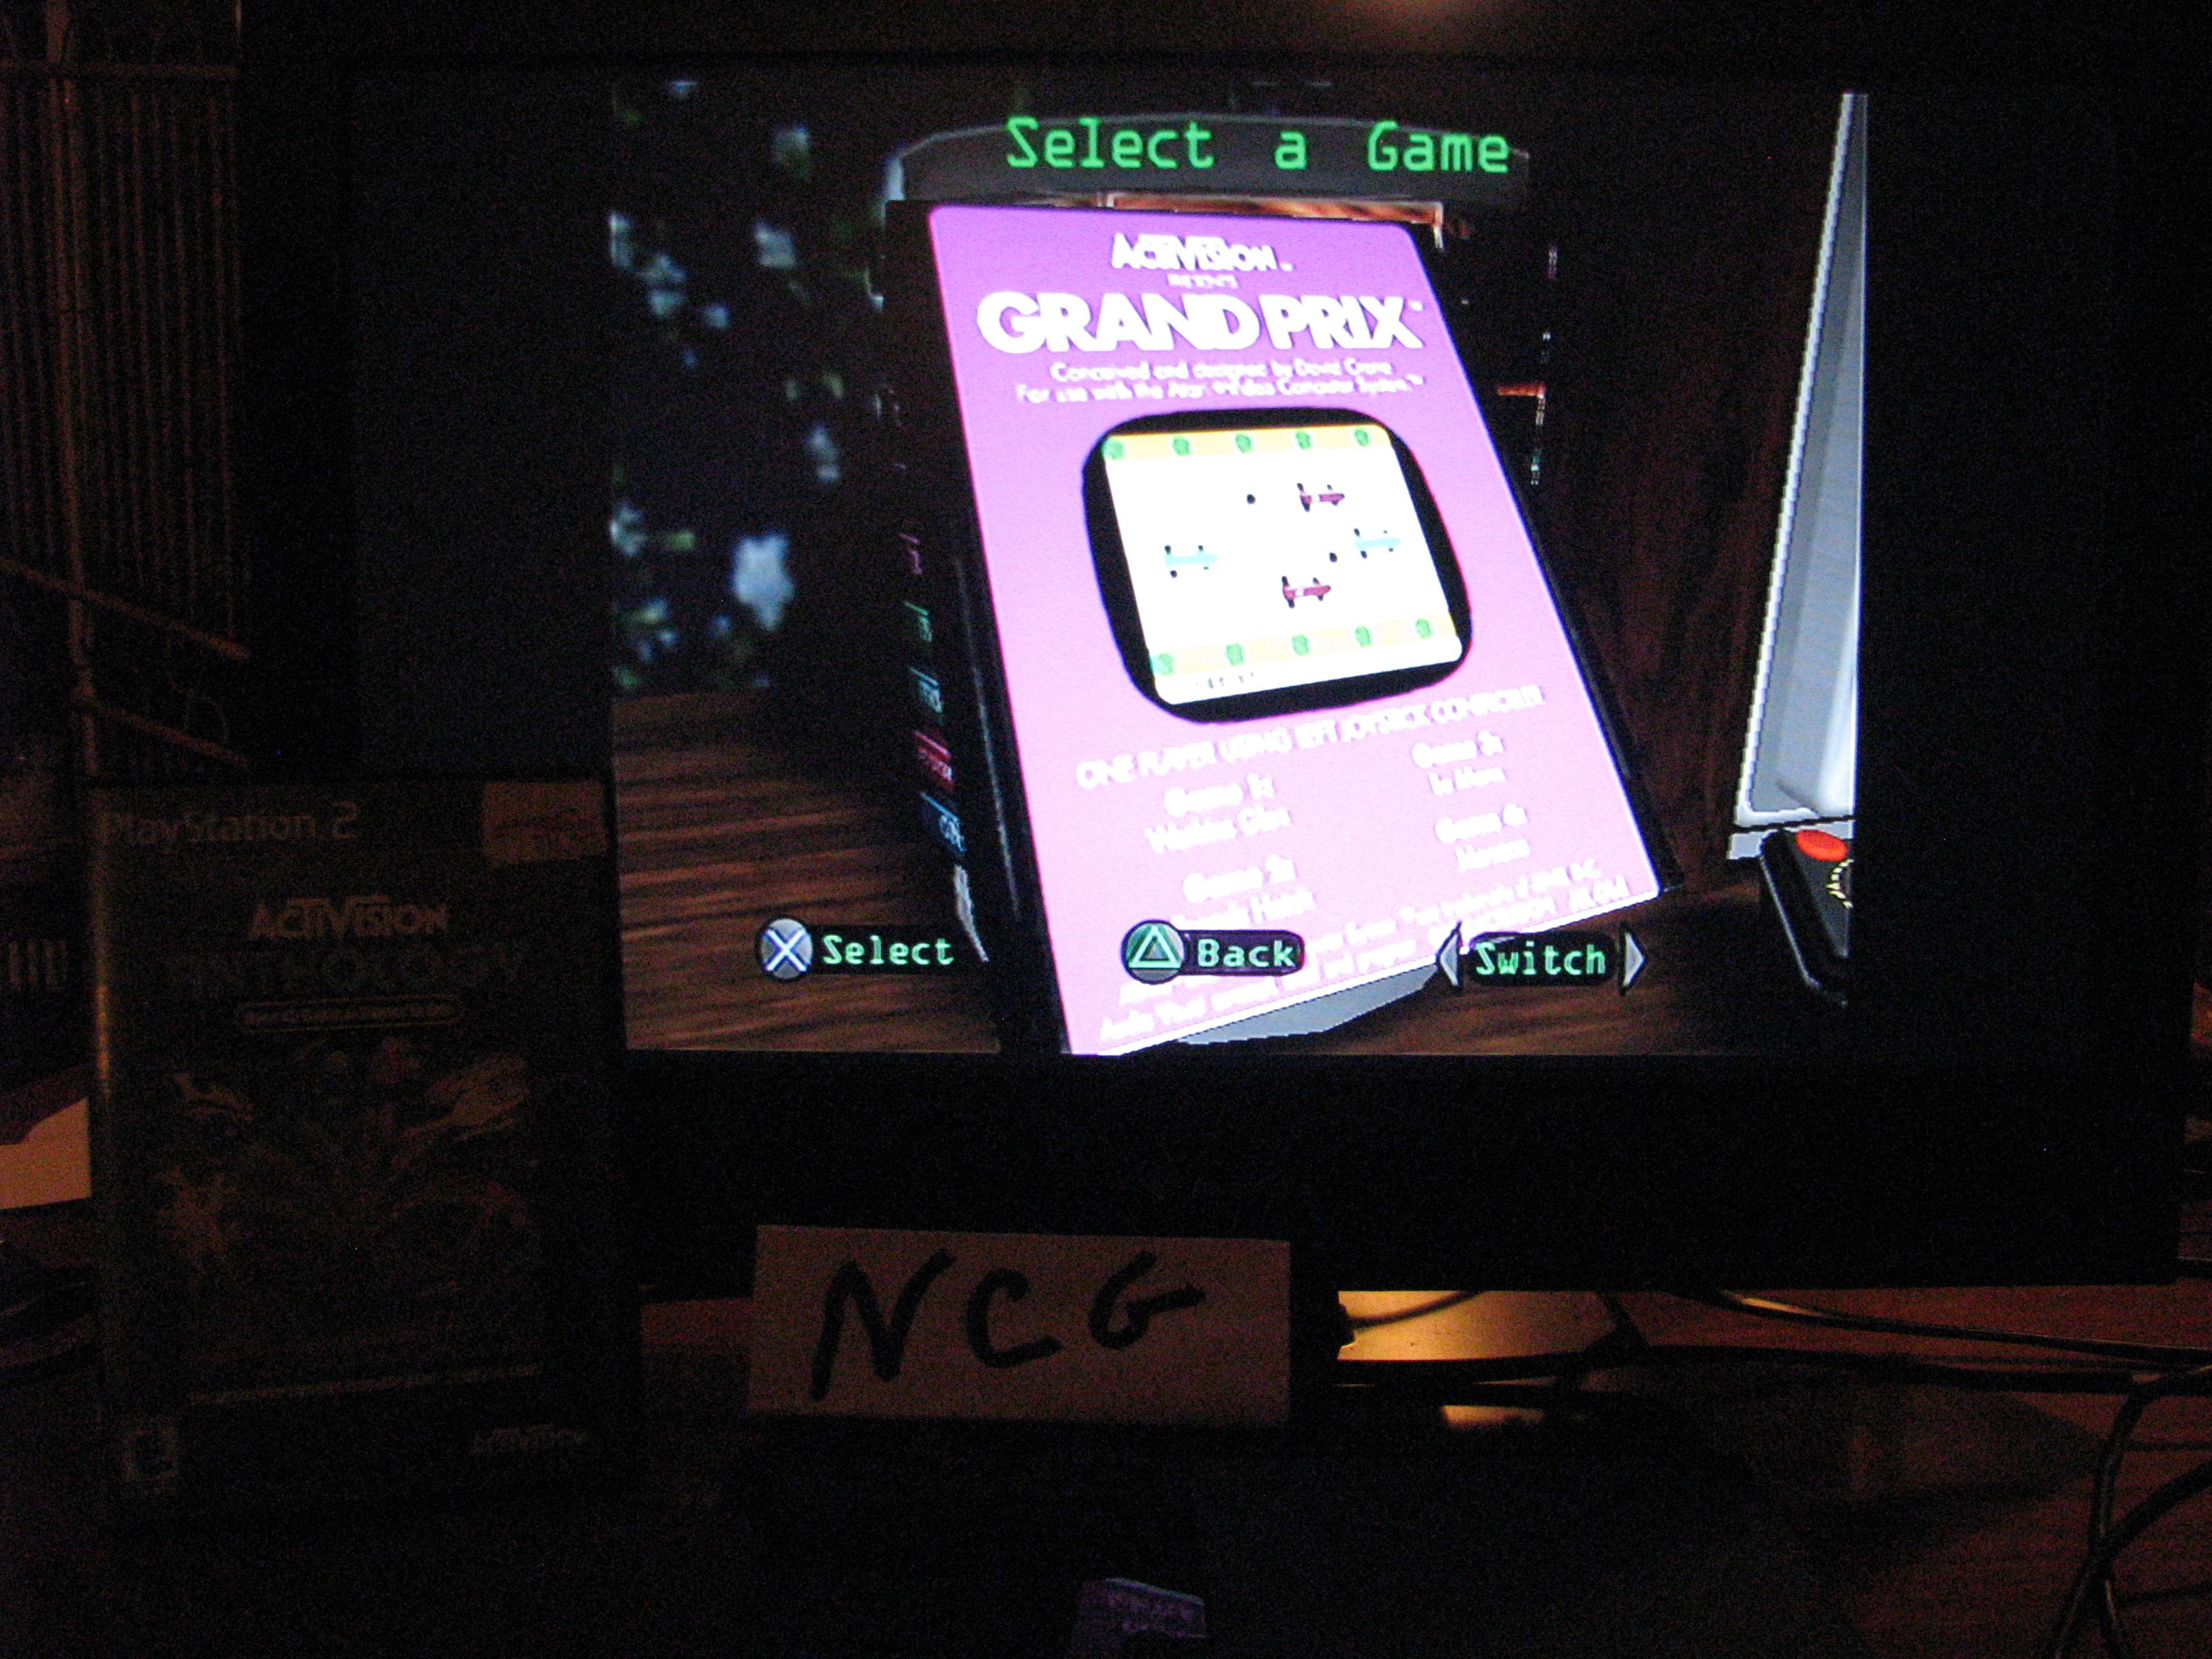 NorthCoastGamer: Activision Anthology: Grand Prix [Game 1B] (Playstation 2) 0:00:29.64 points on 2014-10-15 14:30:04